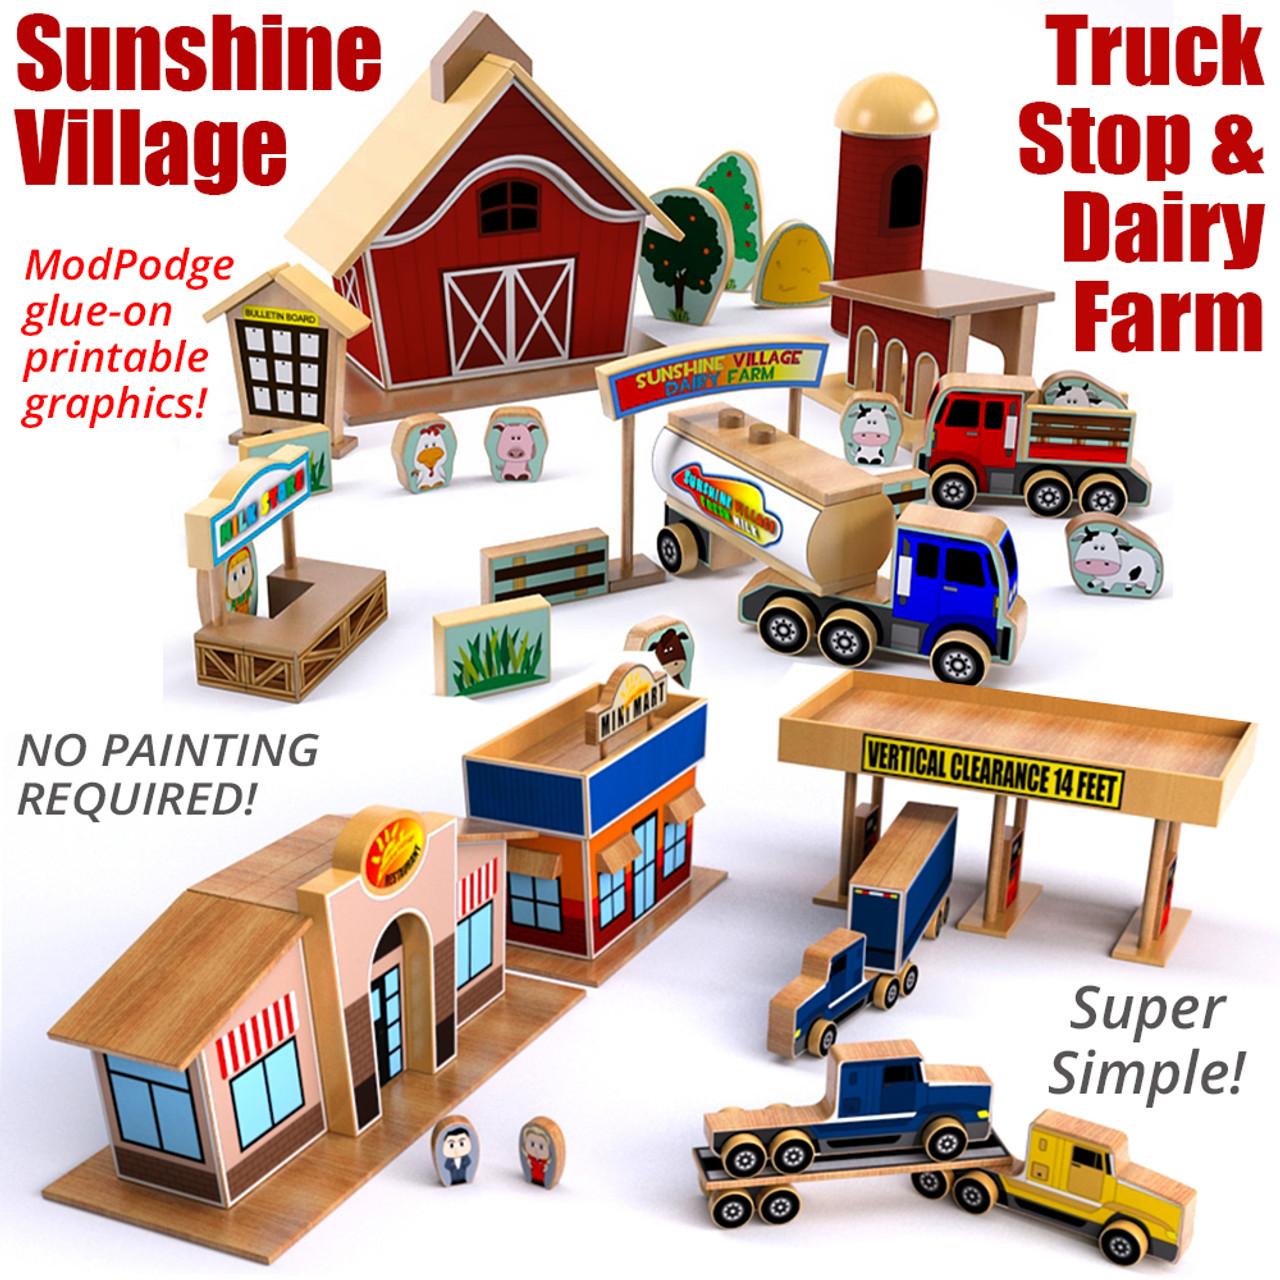 sunshine village truck stop & dairy farm wood toy plans (2 pdf downloads)